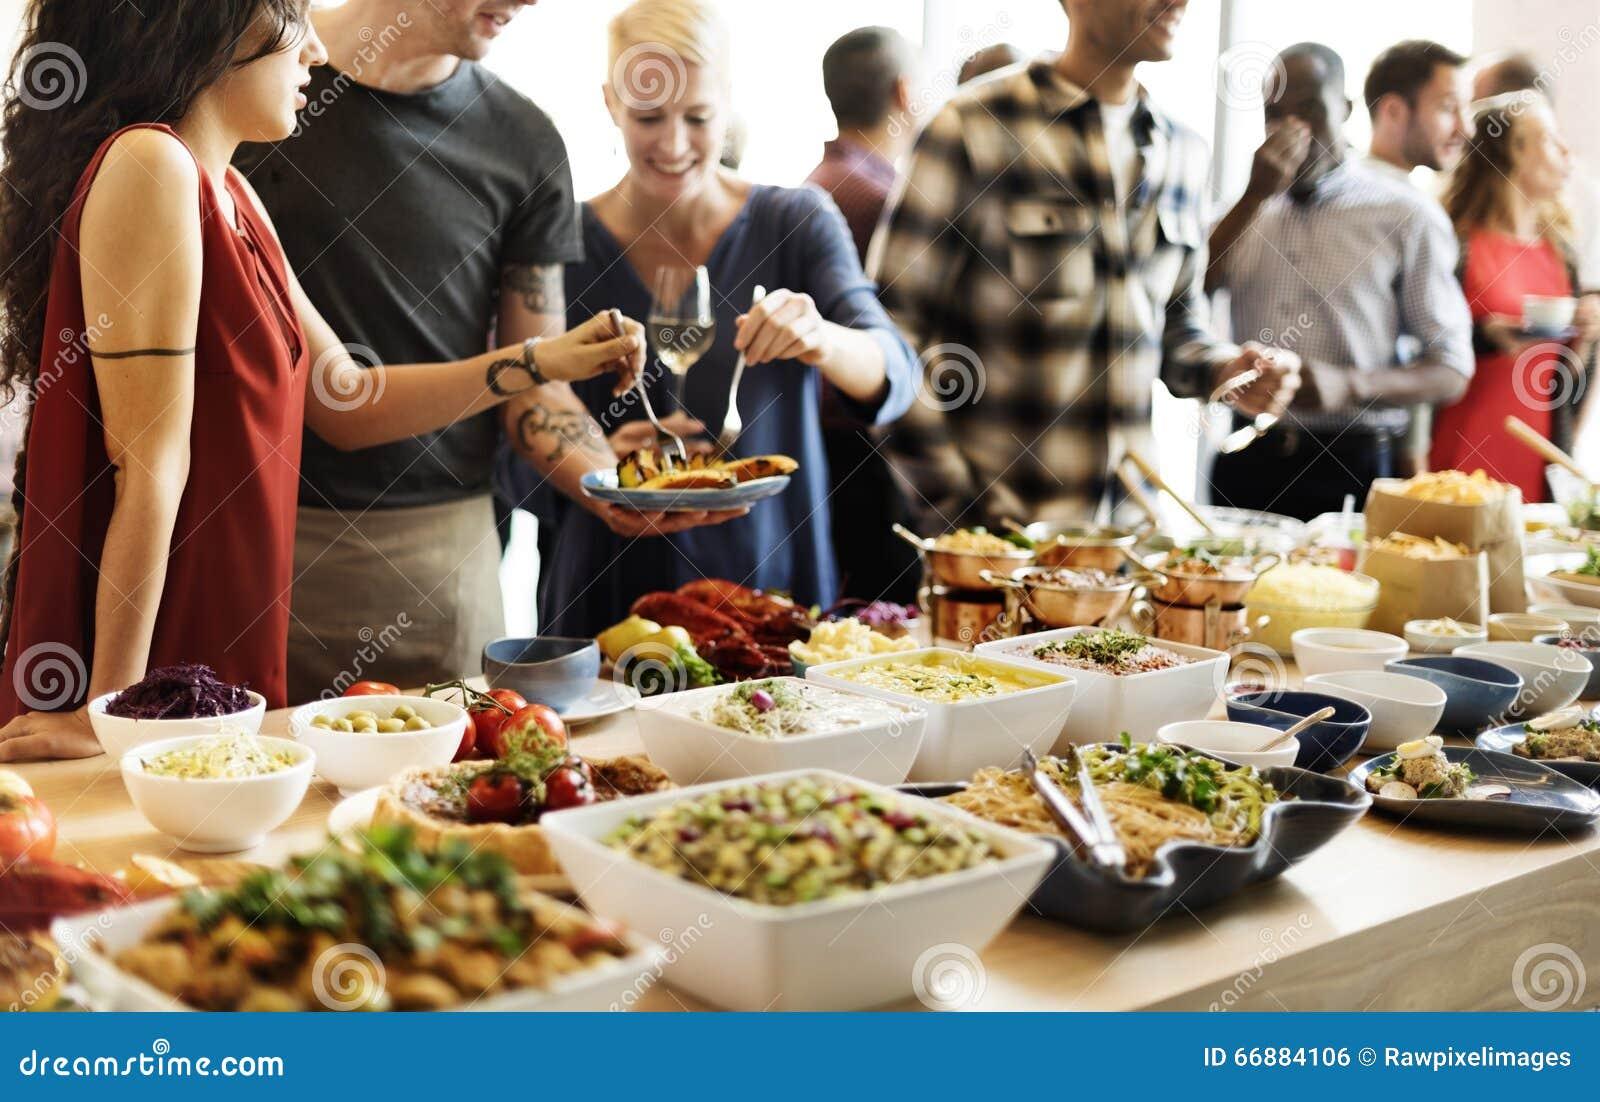 Buffet-Abendessen-Restaurant-Verpflegungs-Lebensmittel-Konzept